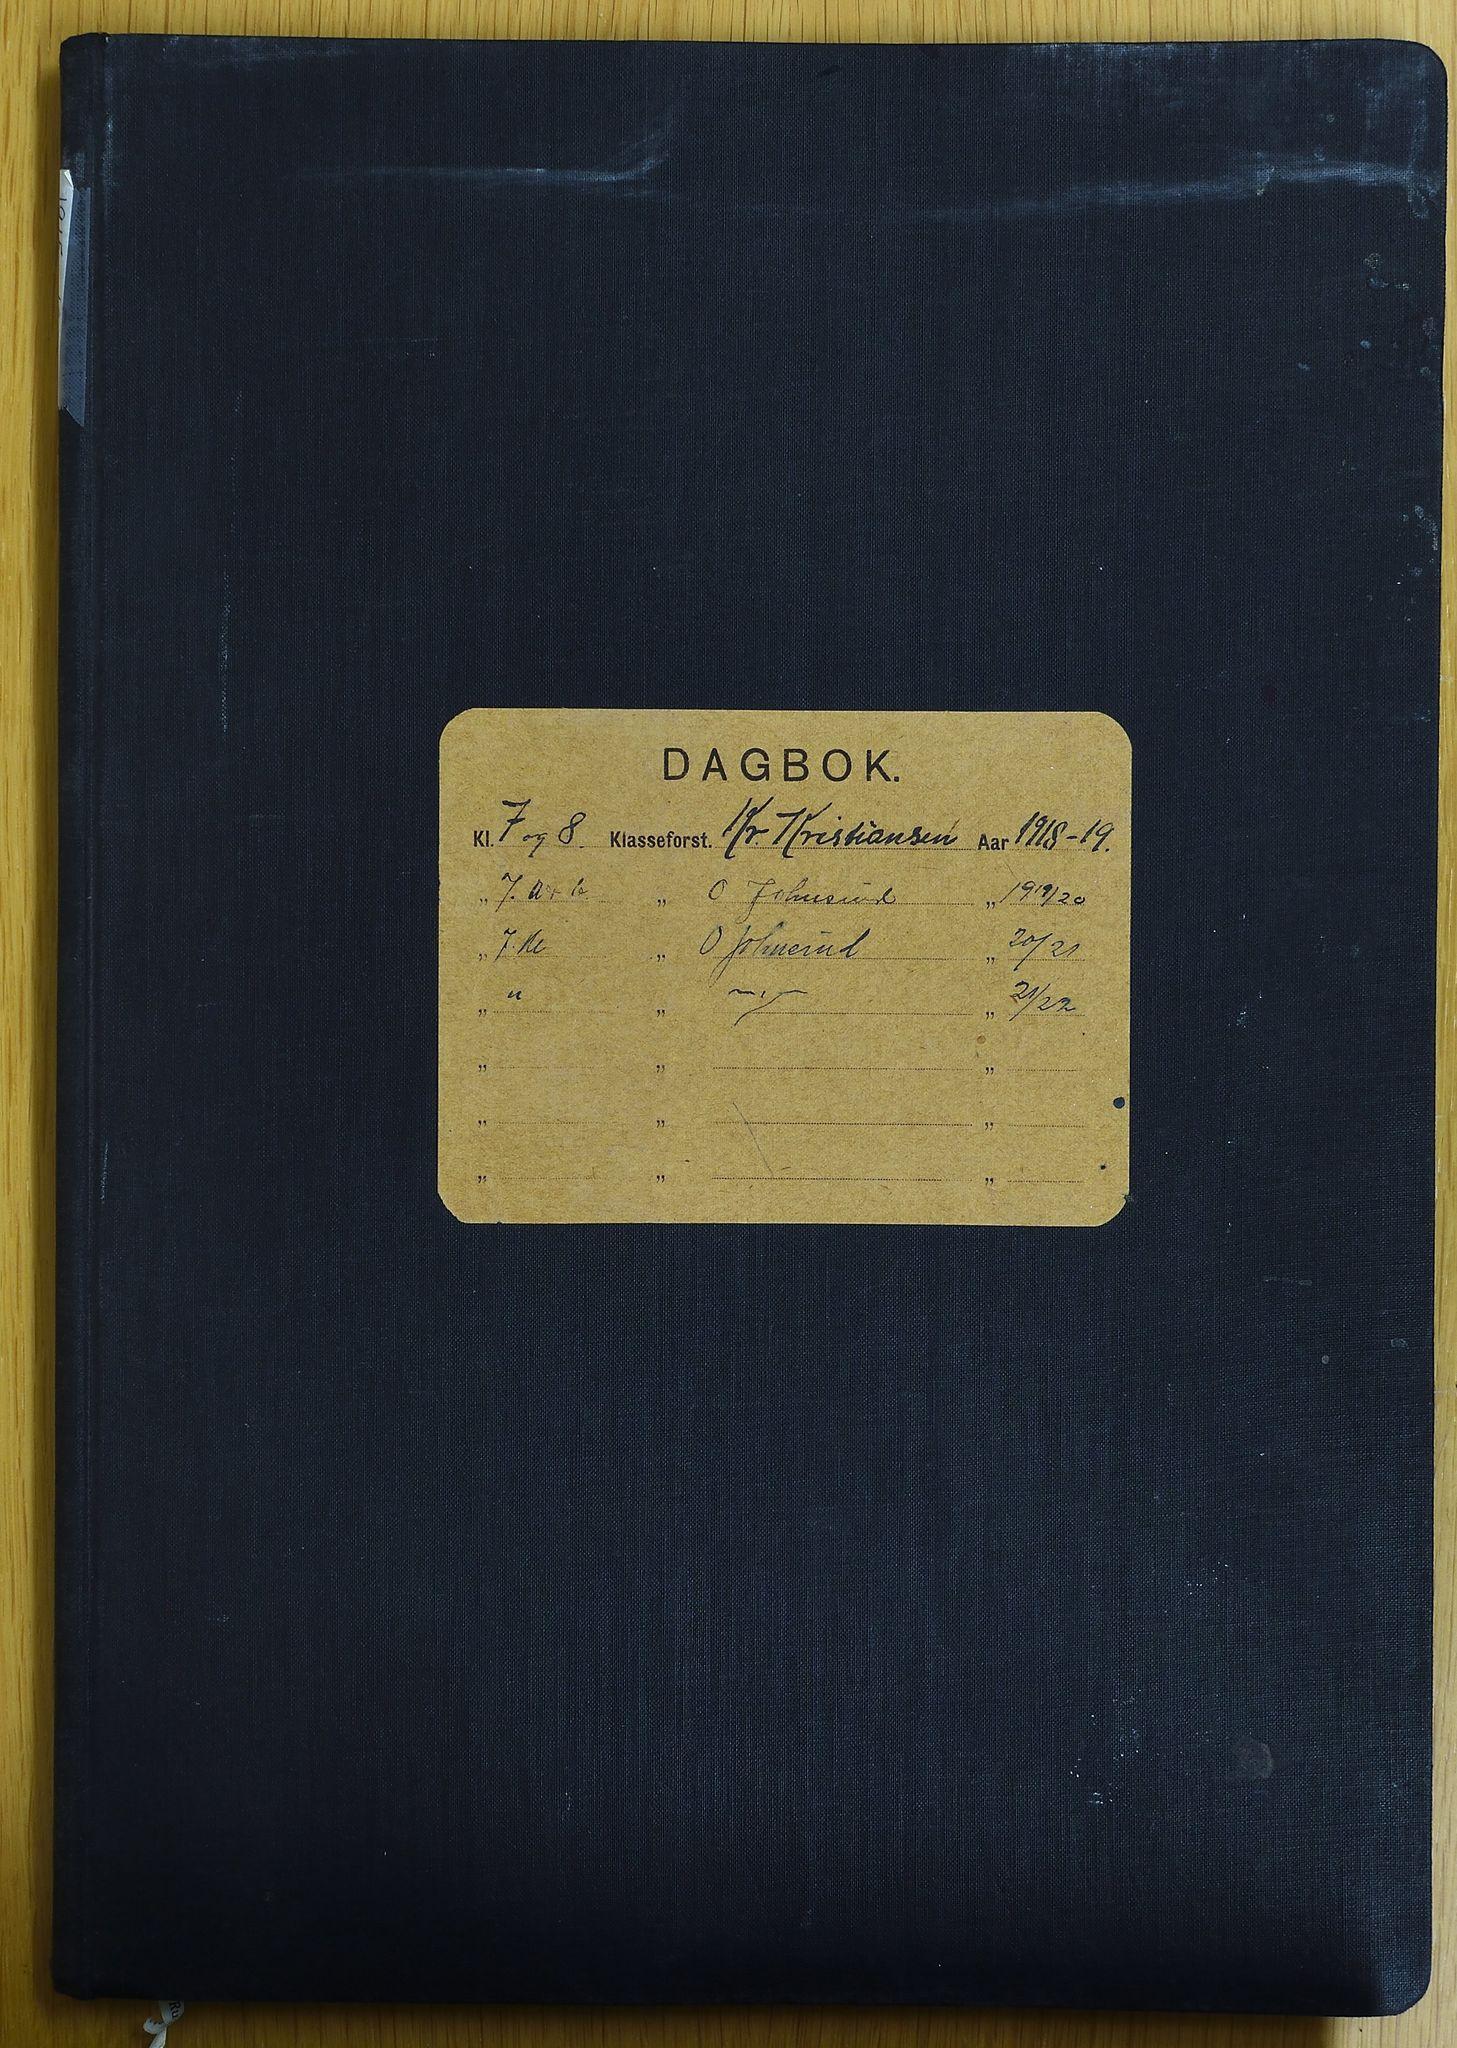 KVT, Vestre Toten municipality archive: School protocol, Raufoss School 1918-1925, 1918-1925